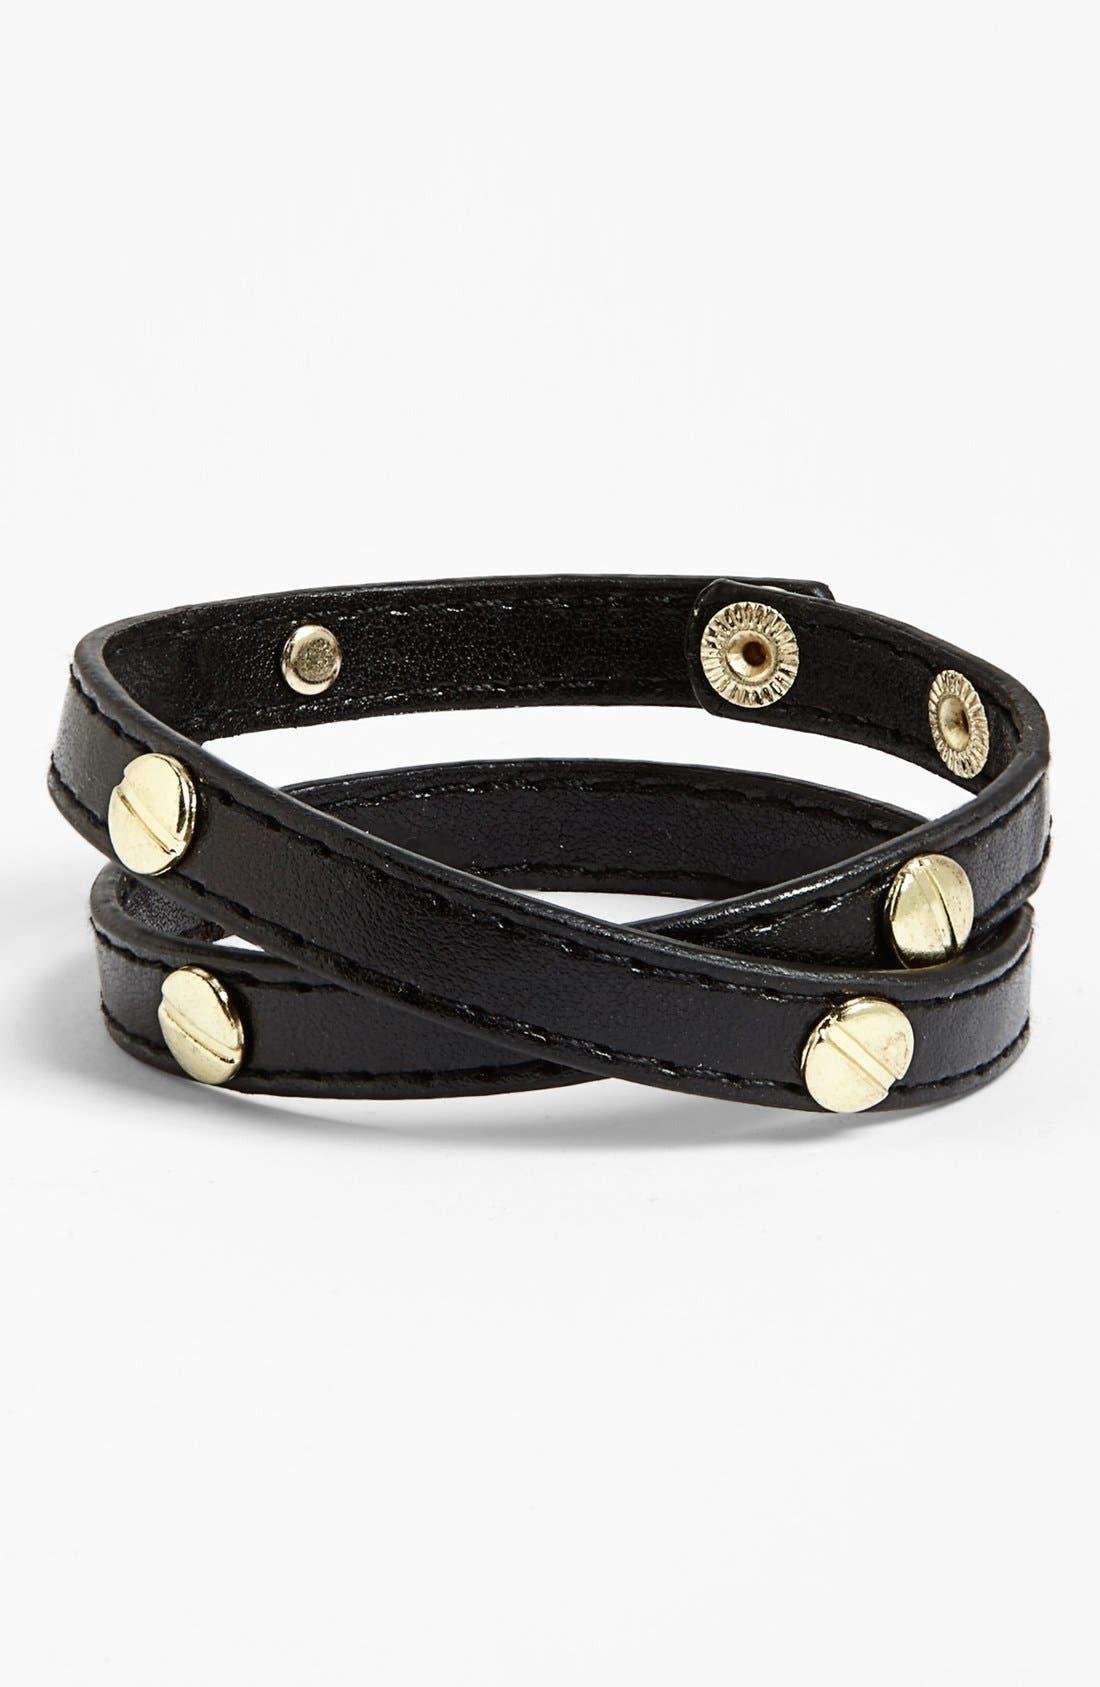 Main Image - Carole Studded Faux Leather Wrap Bracelet (Juniors)